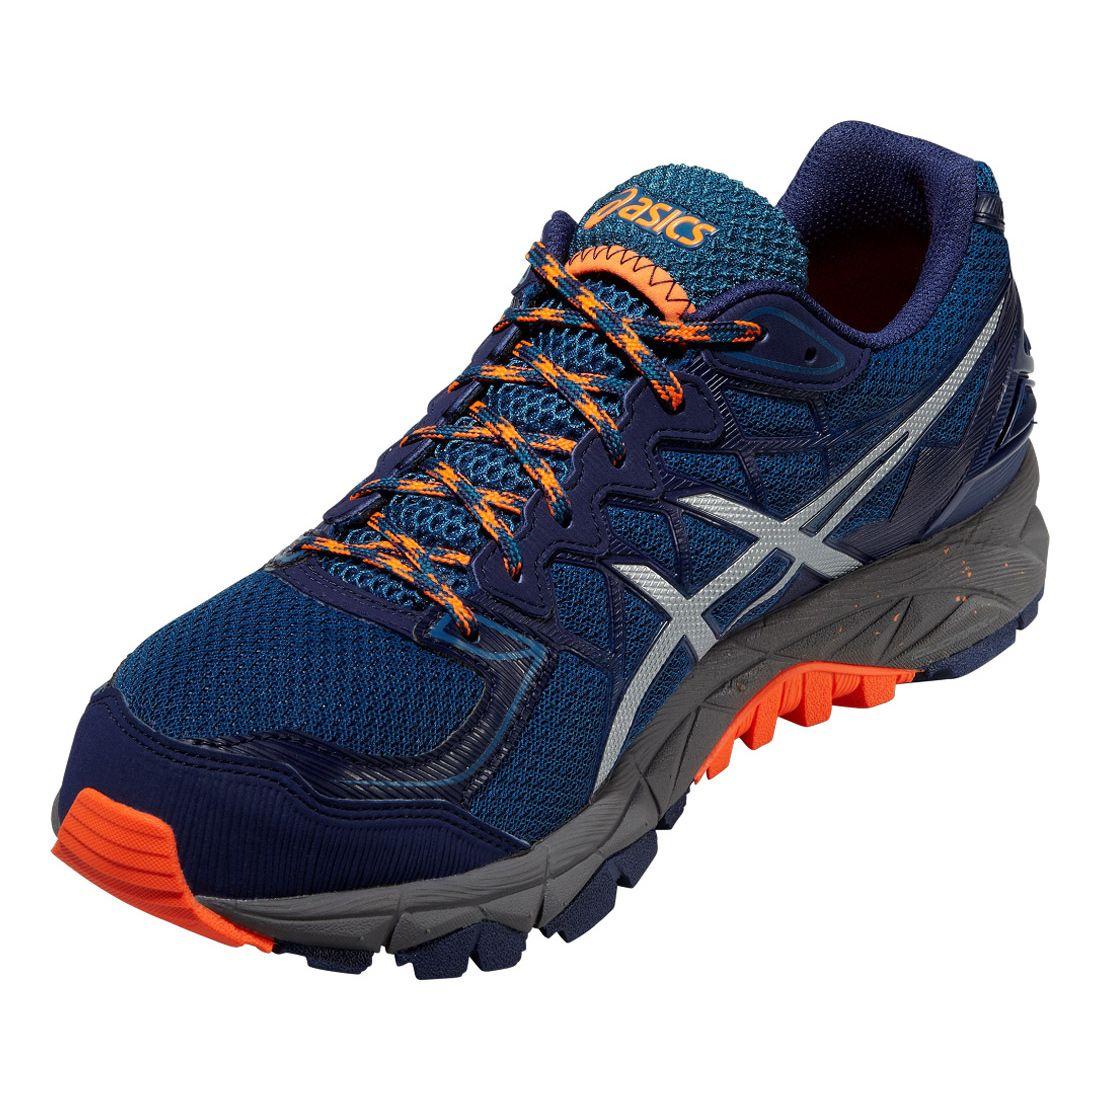 asics mens gel-fuji trabuco trail running shoes review